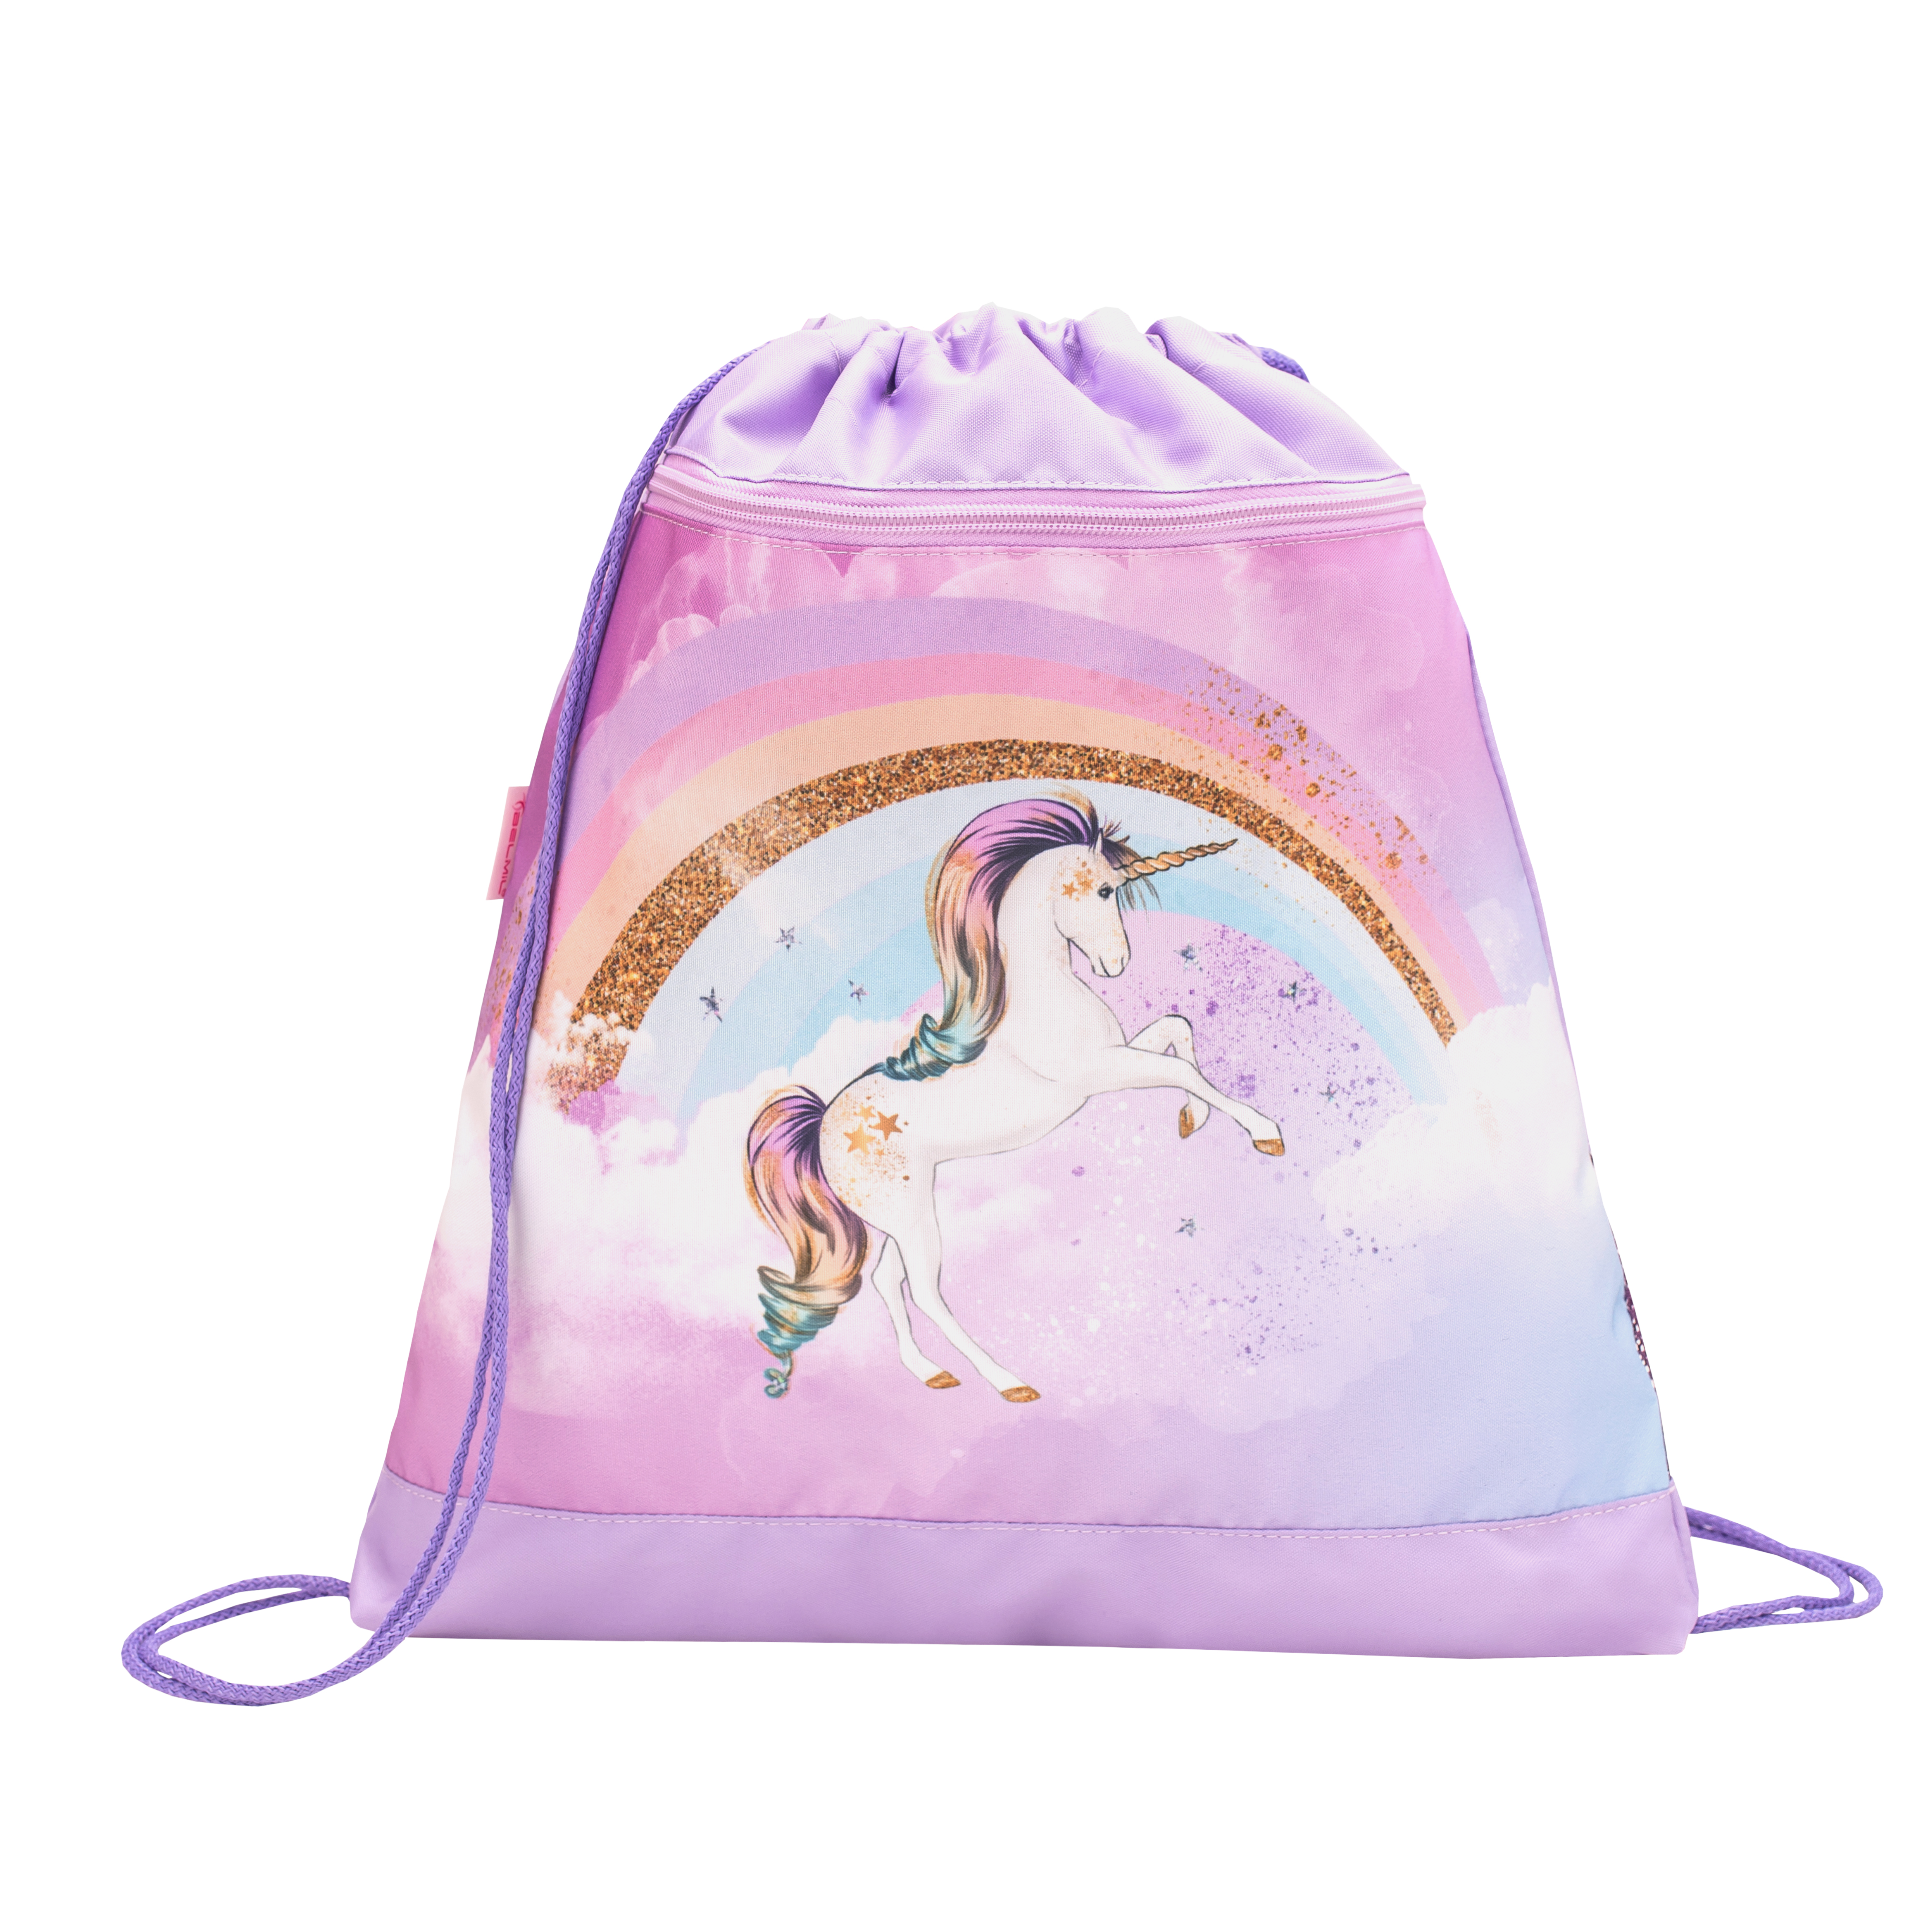 4-tlg. Schulranzenset Customize-Me 19 Liter - Rainbow Unicorn